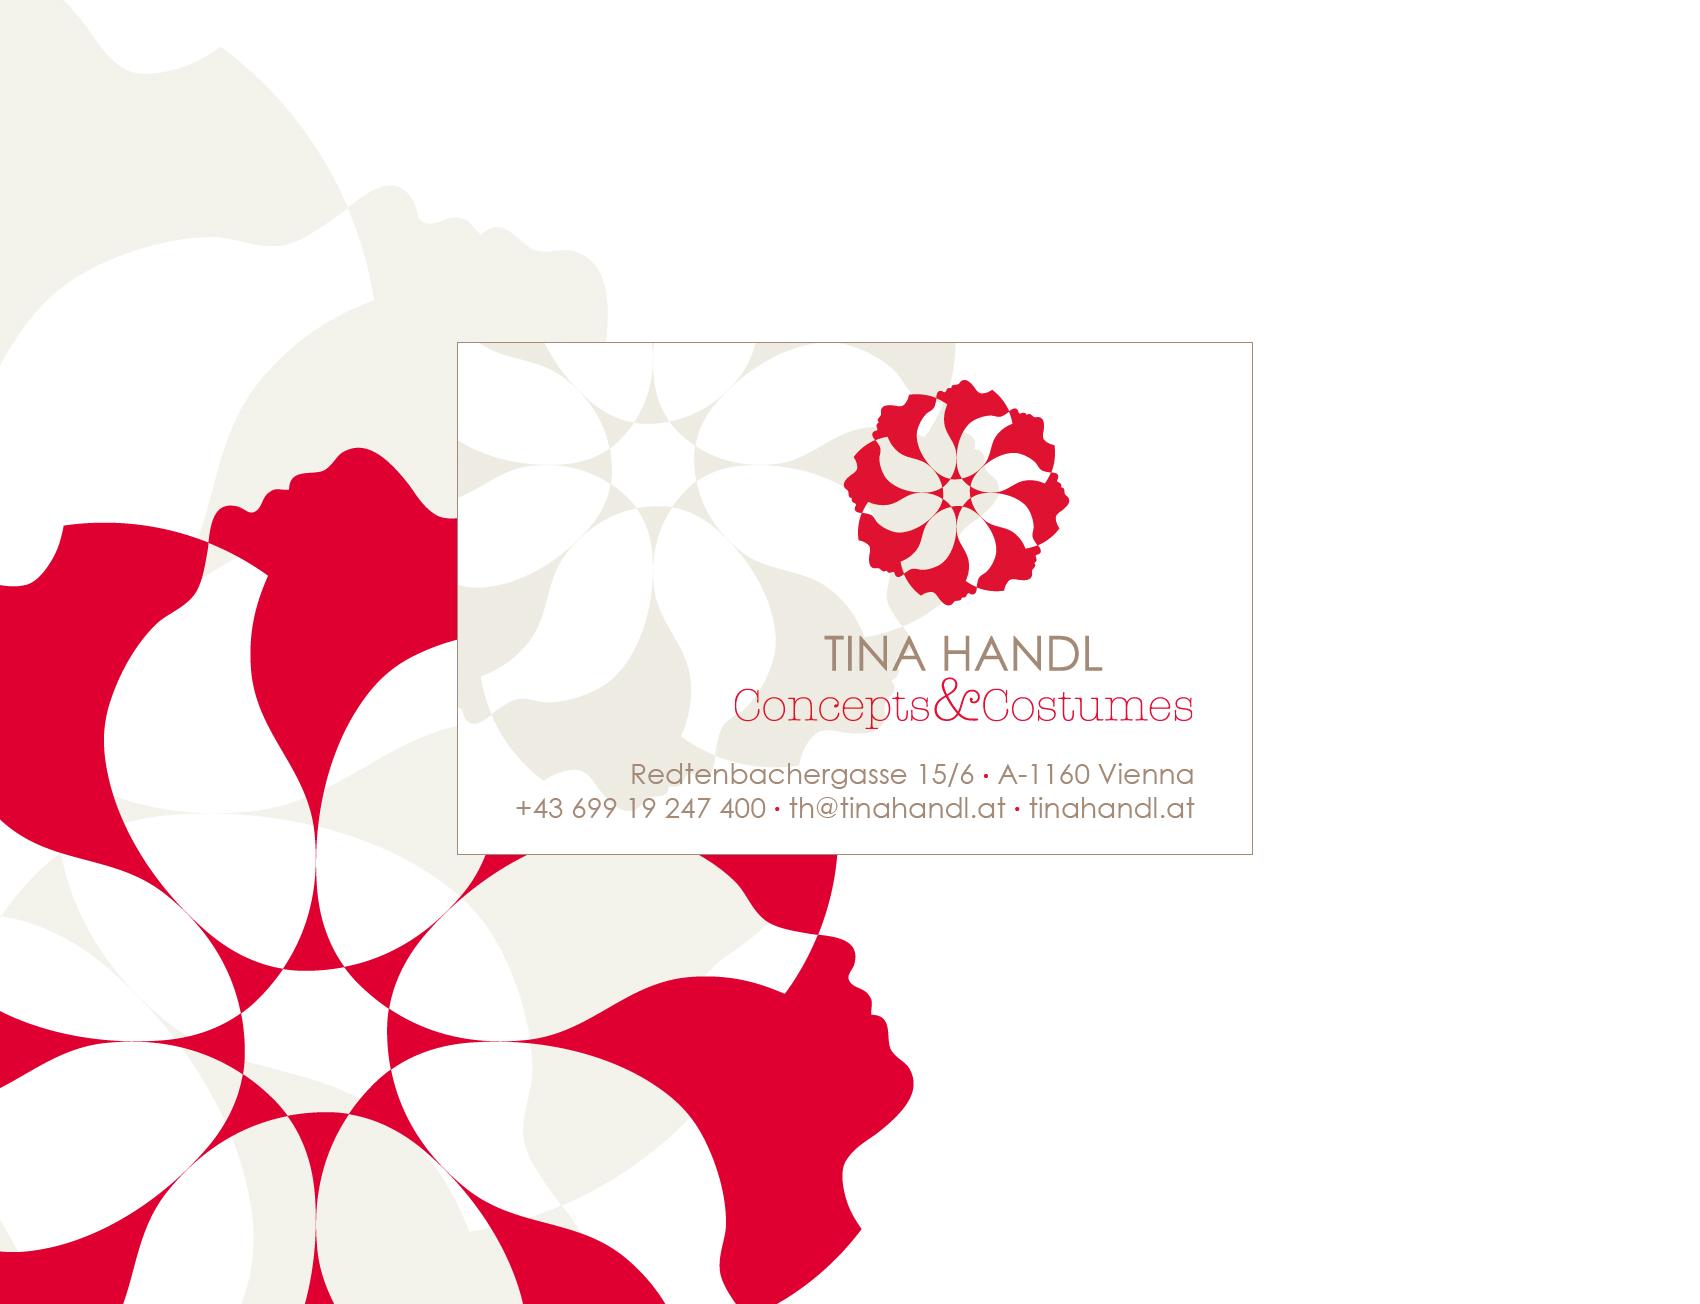 Tina Handl Kontaktdaten